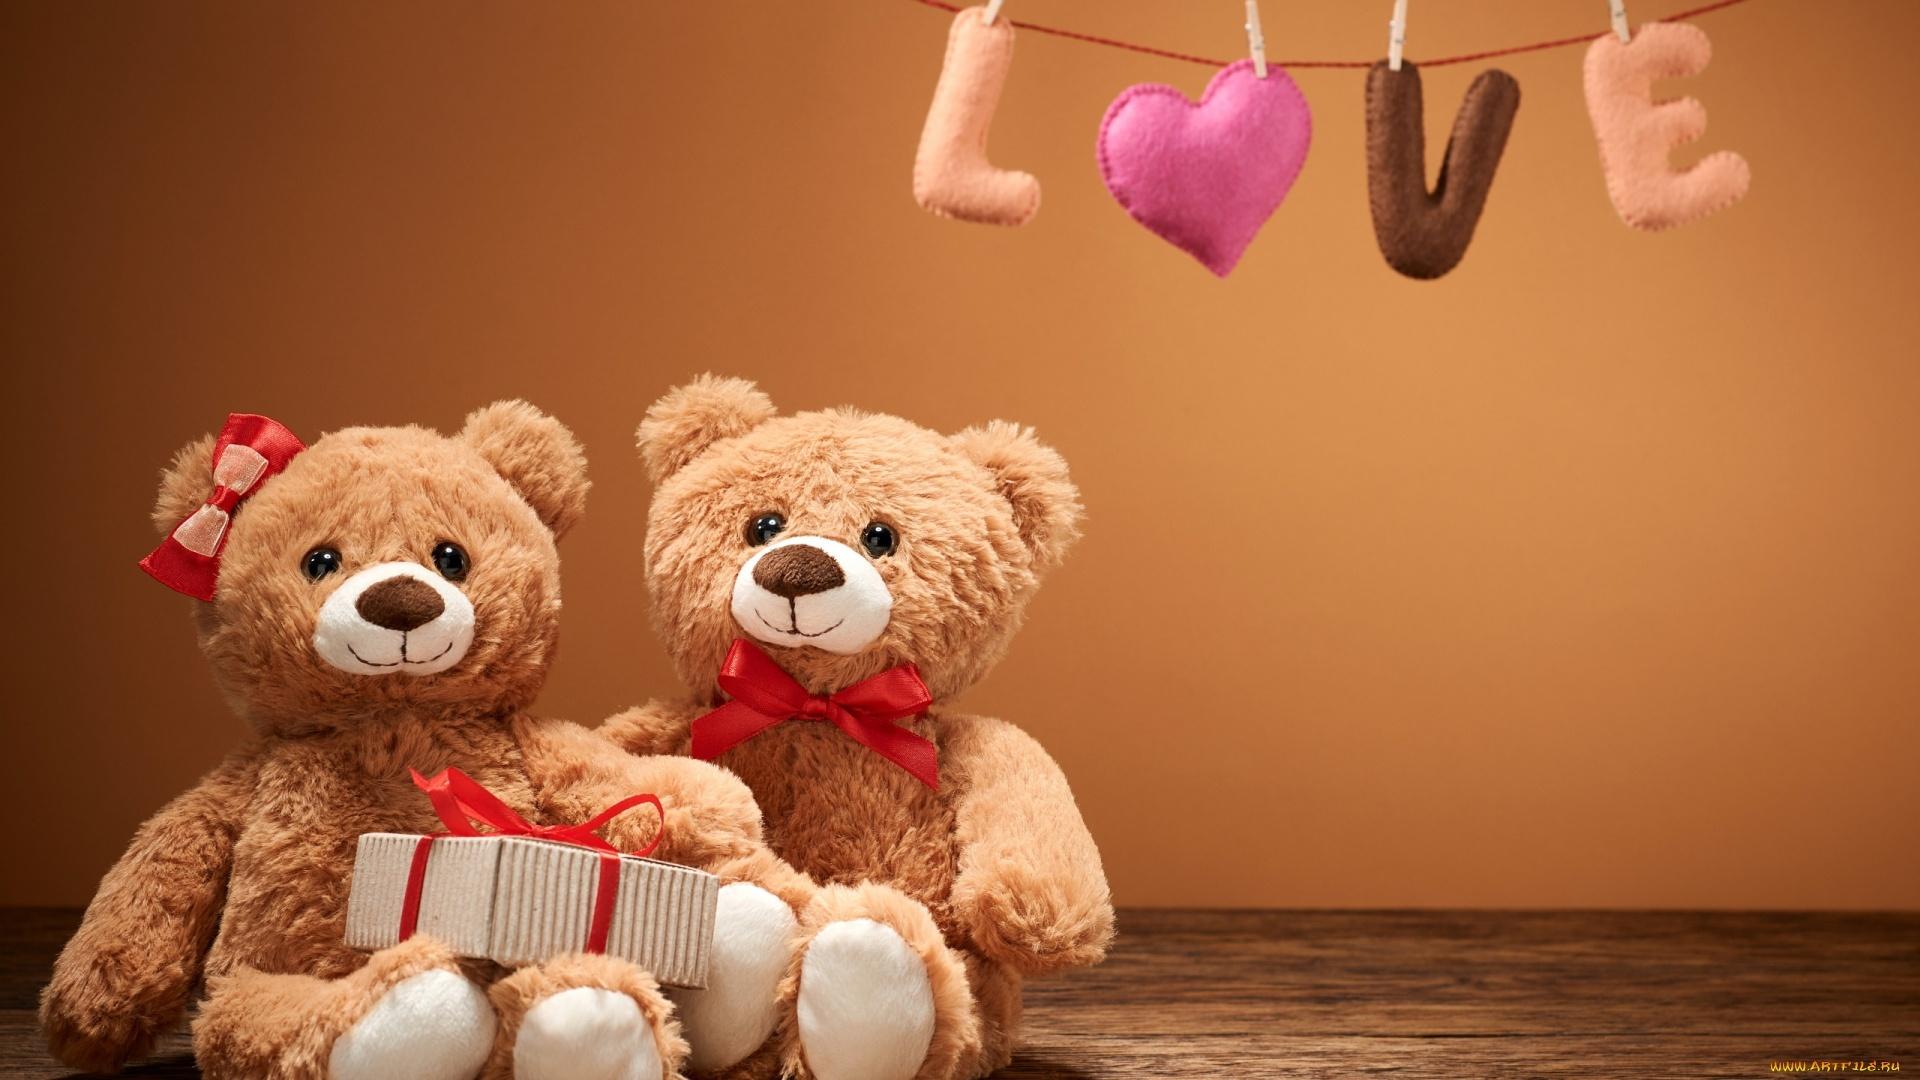 Teddy Bear HD Download